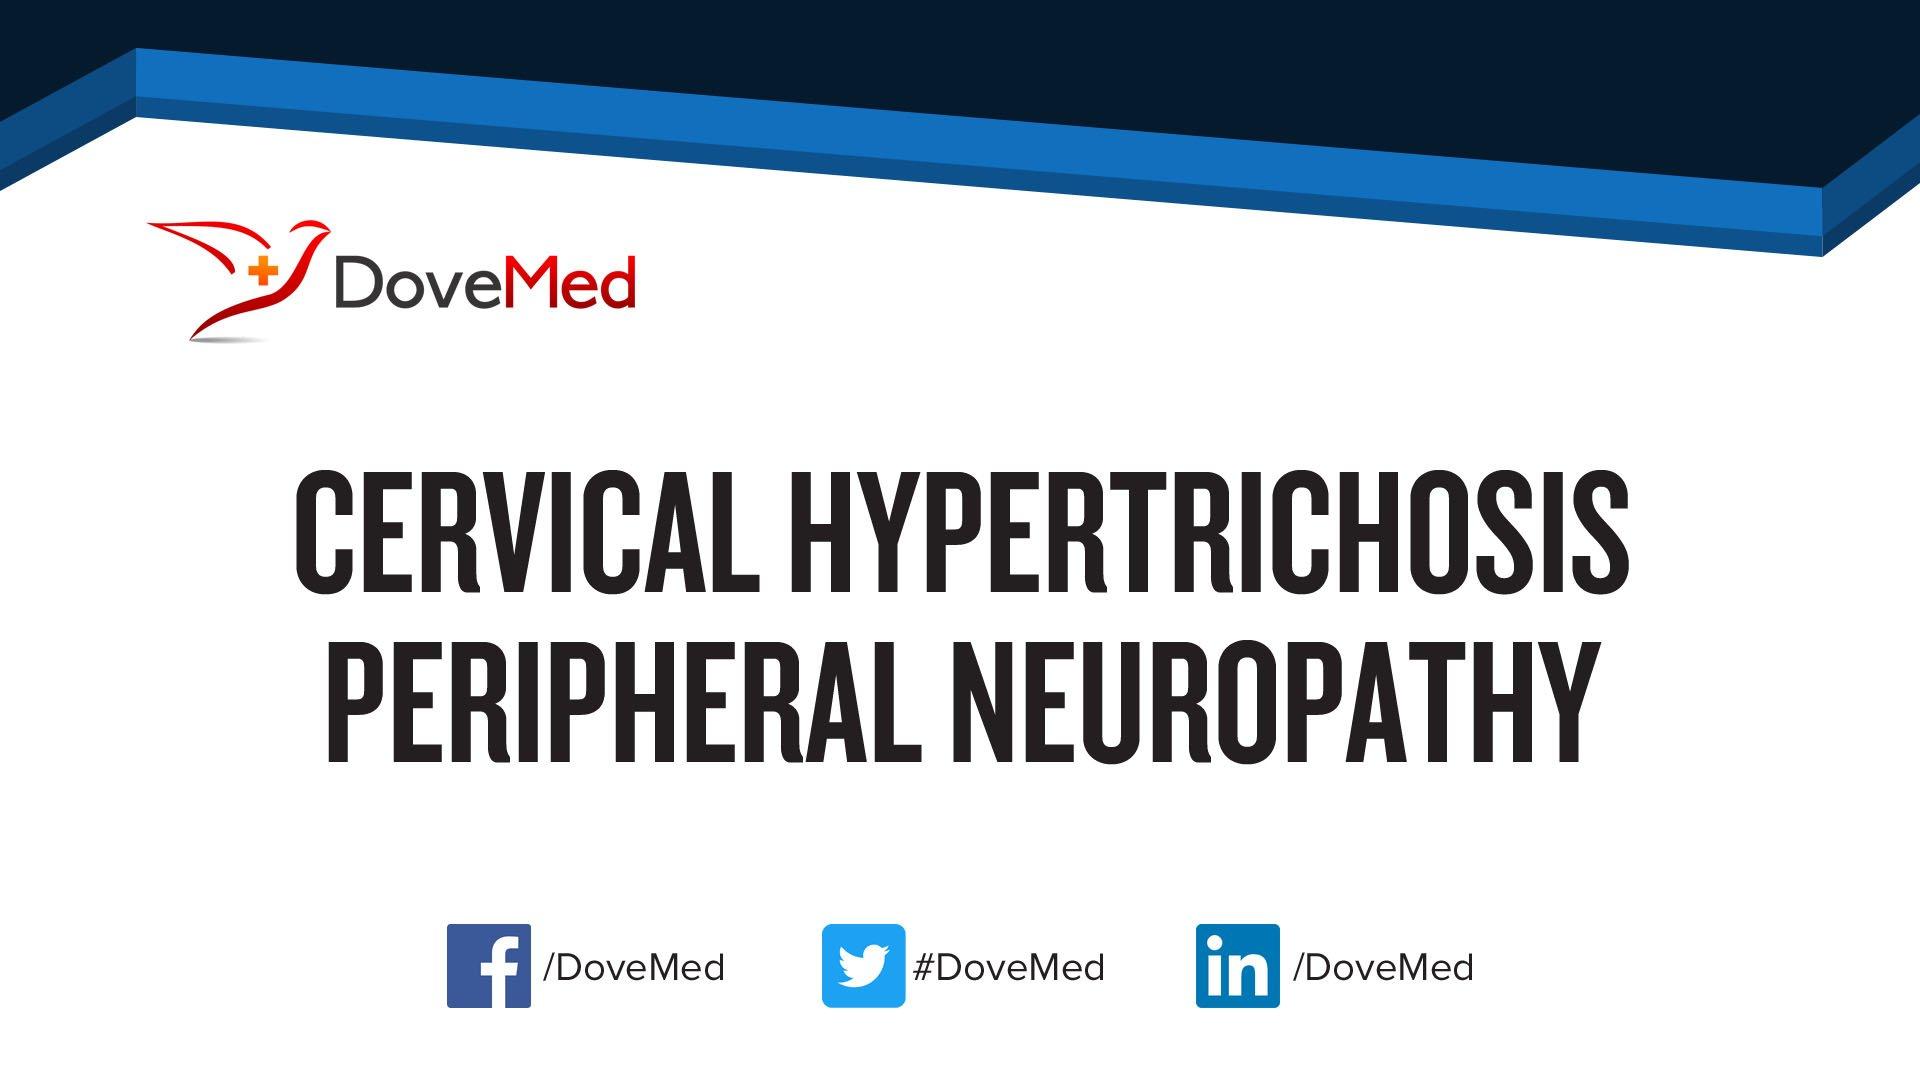 Cervical_hypertrichosis_peripheral_neuropathy.original.jpg